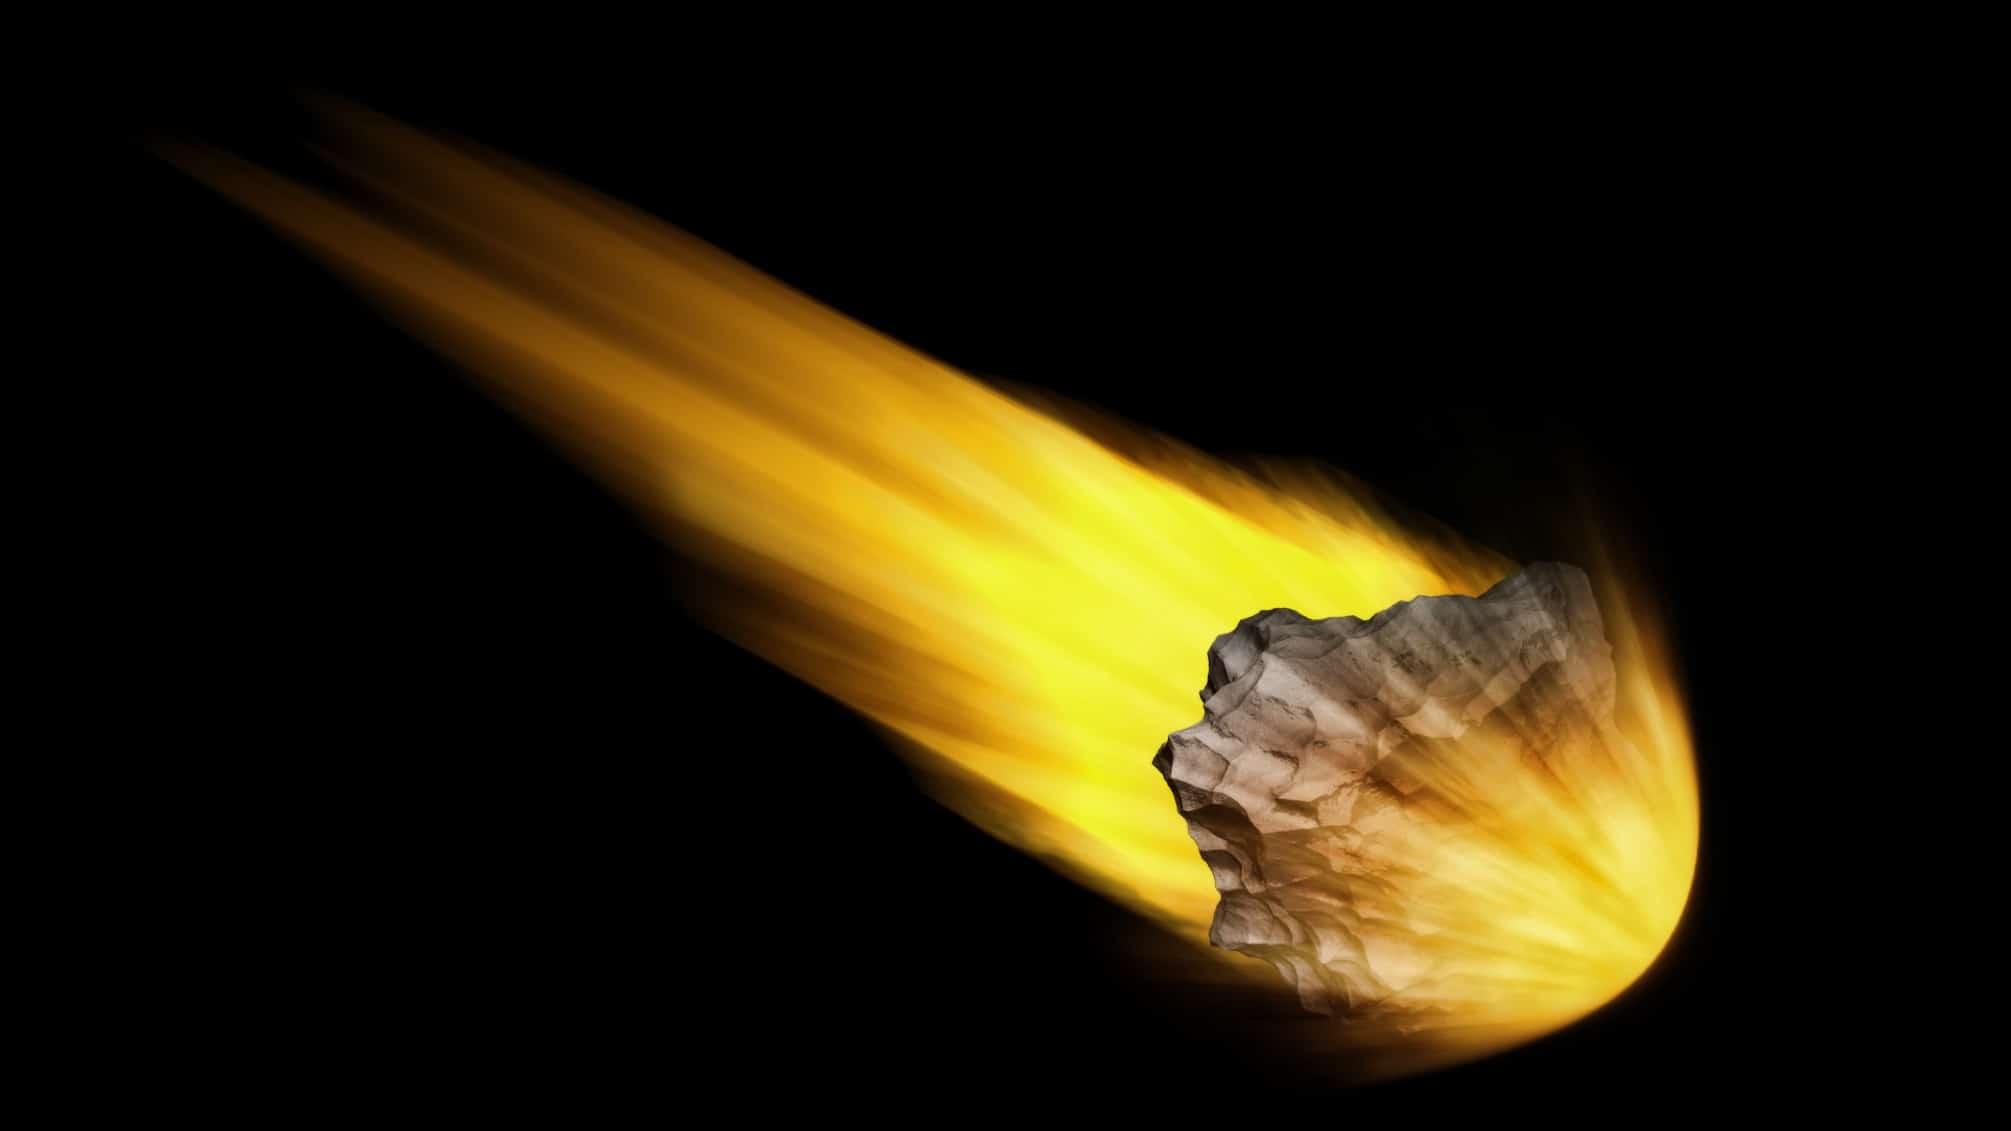 asx iron ore share price crash represented by meteor speeding through space